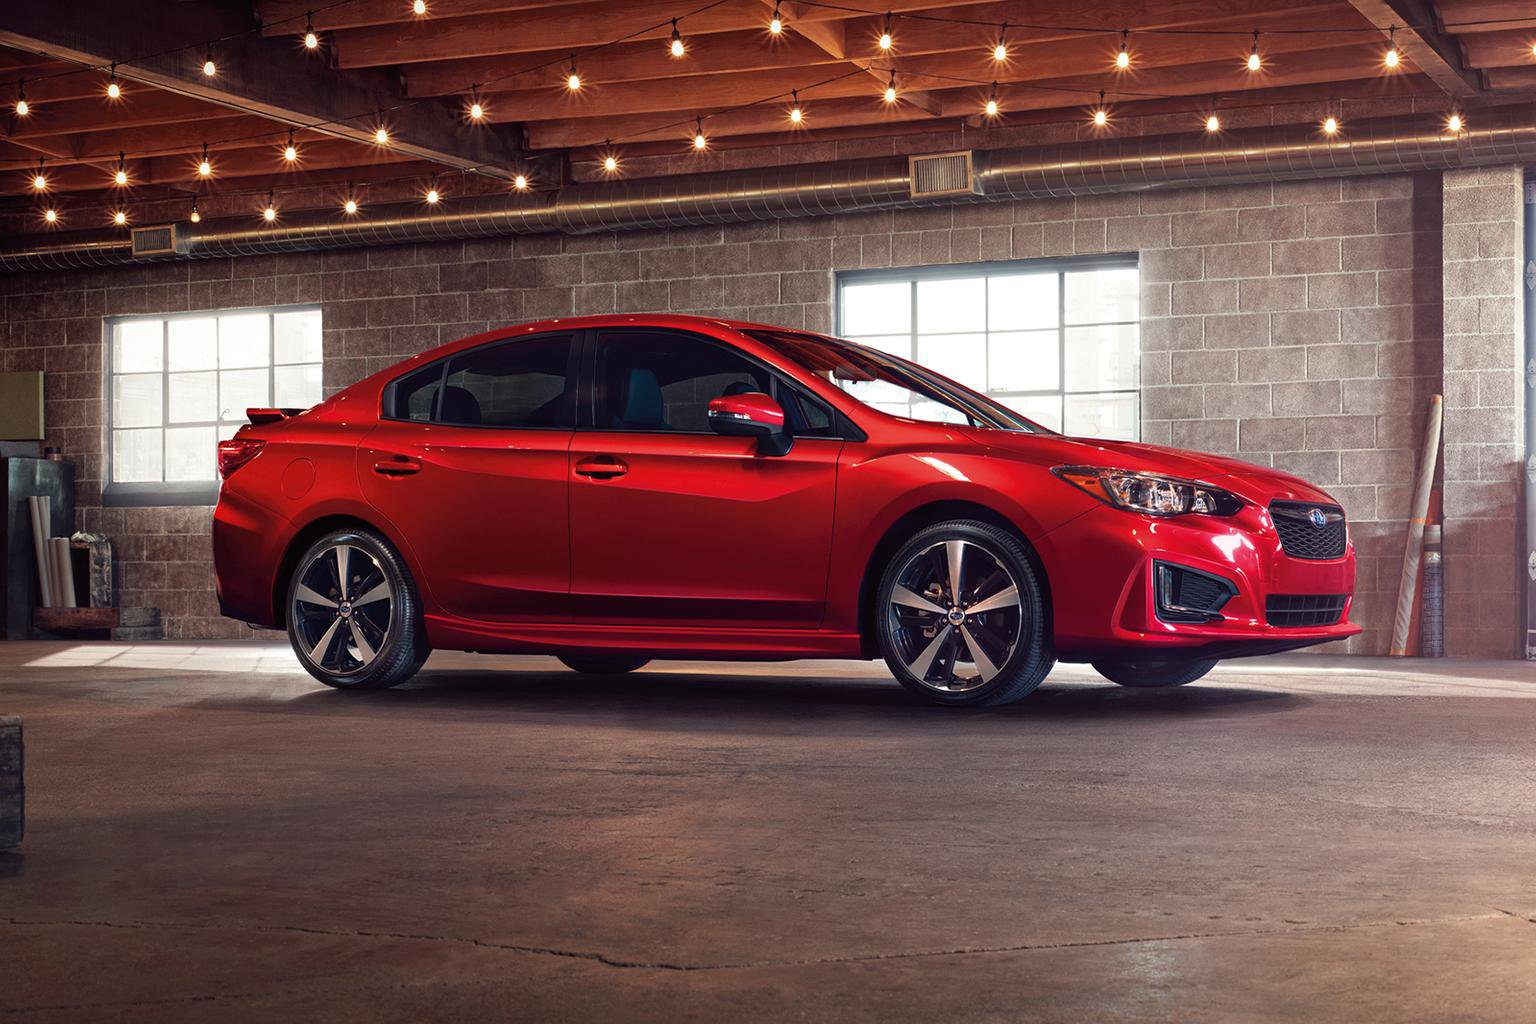 New Subaru Impreza revealed ahead of New York motor show